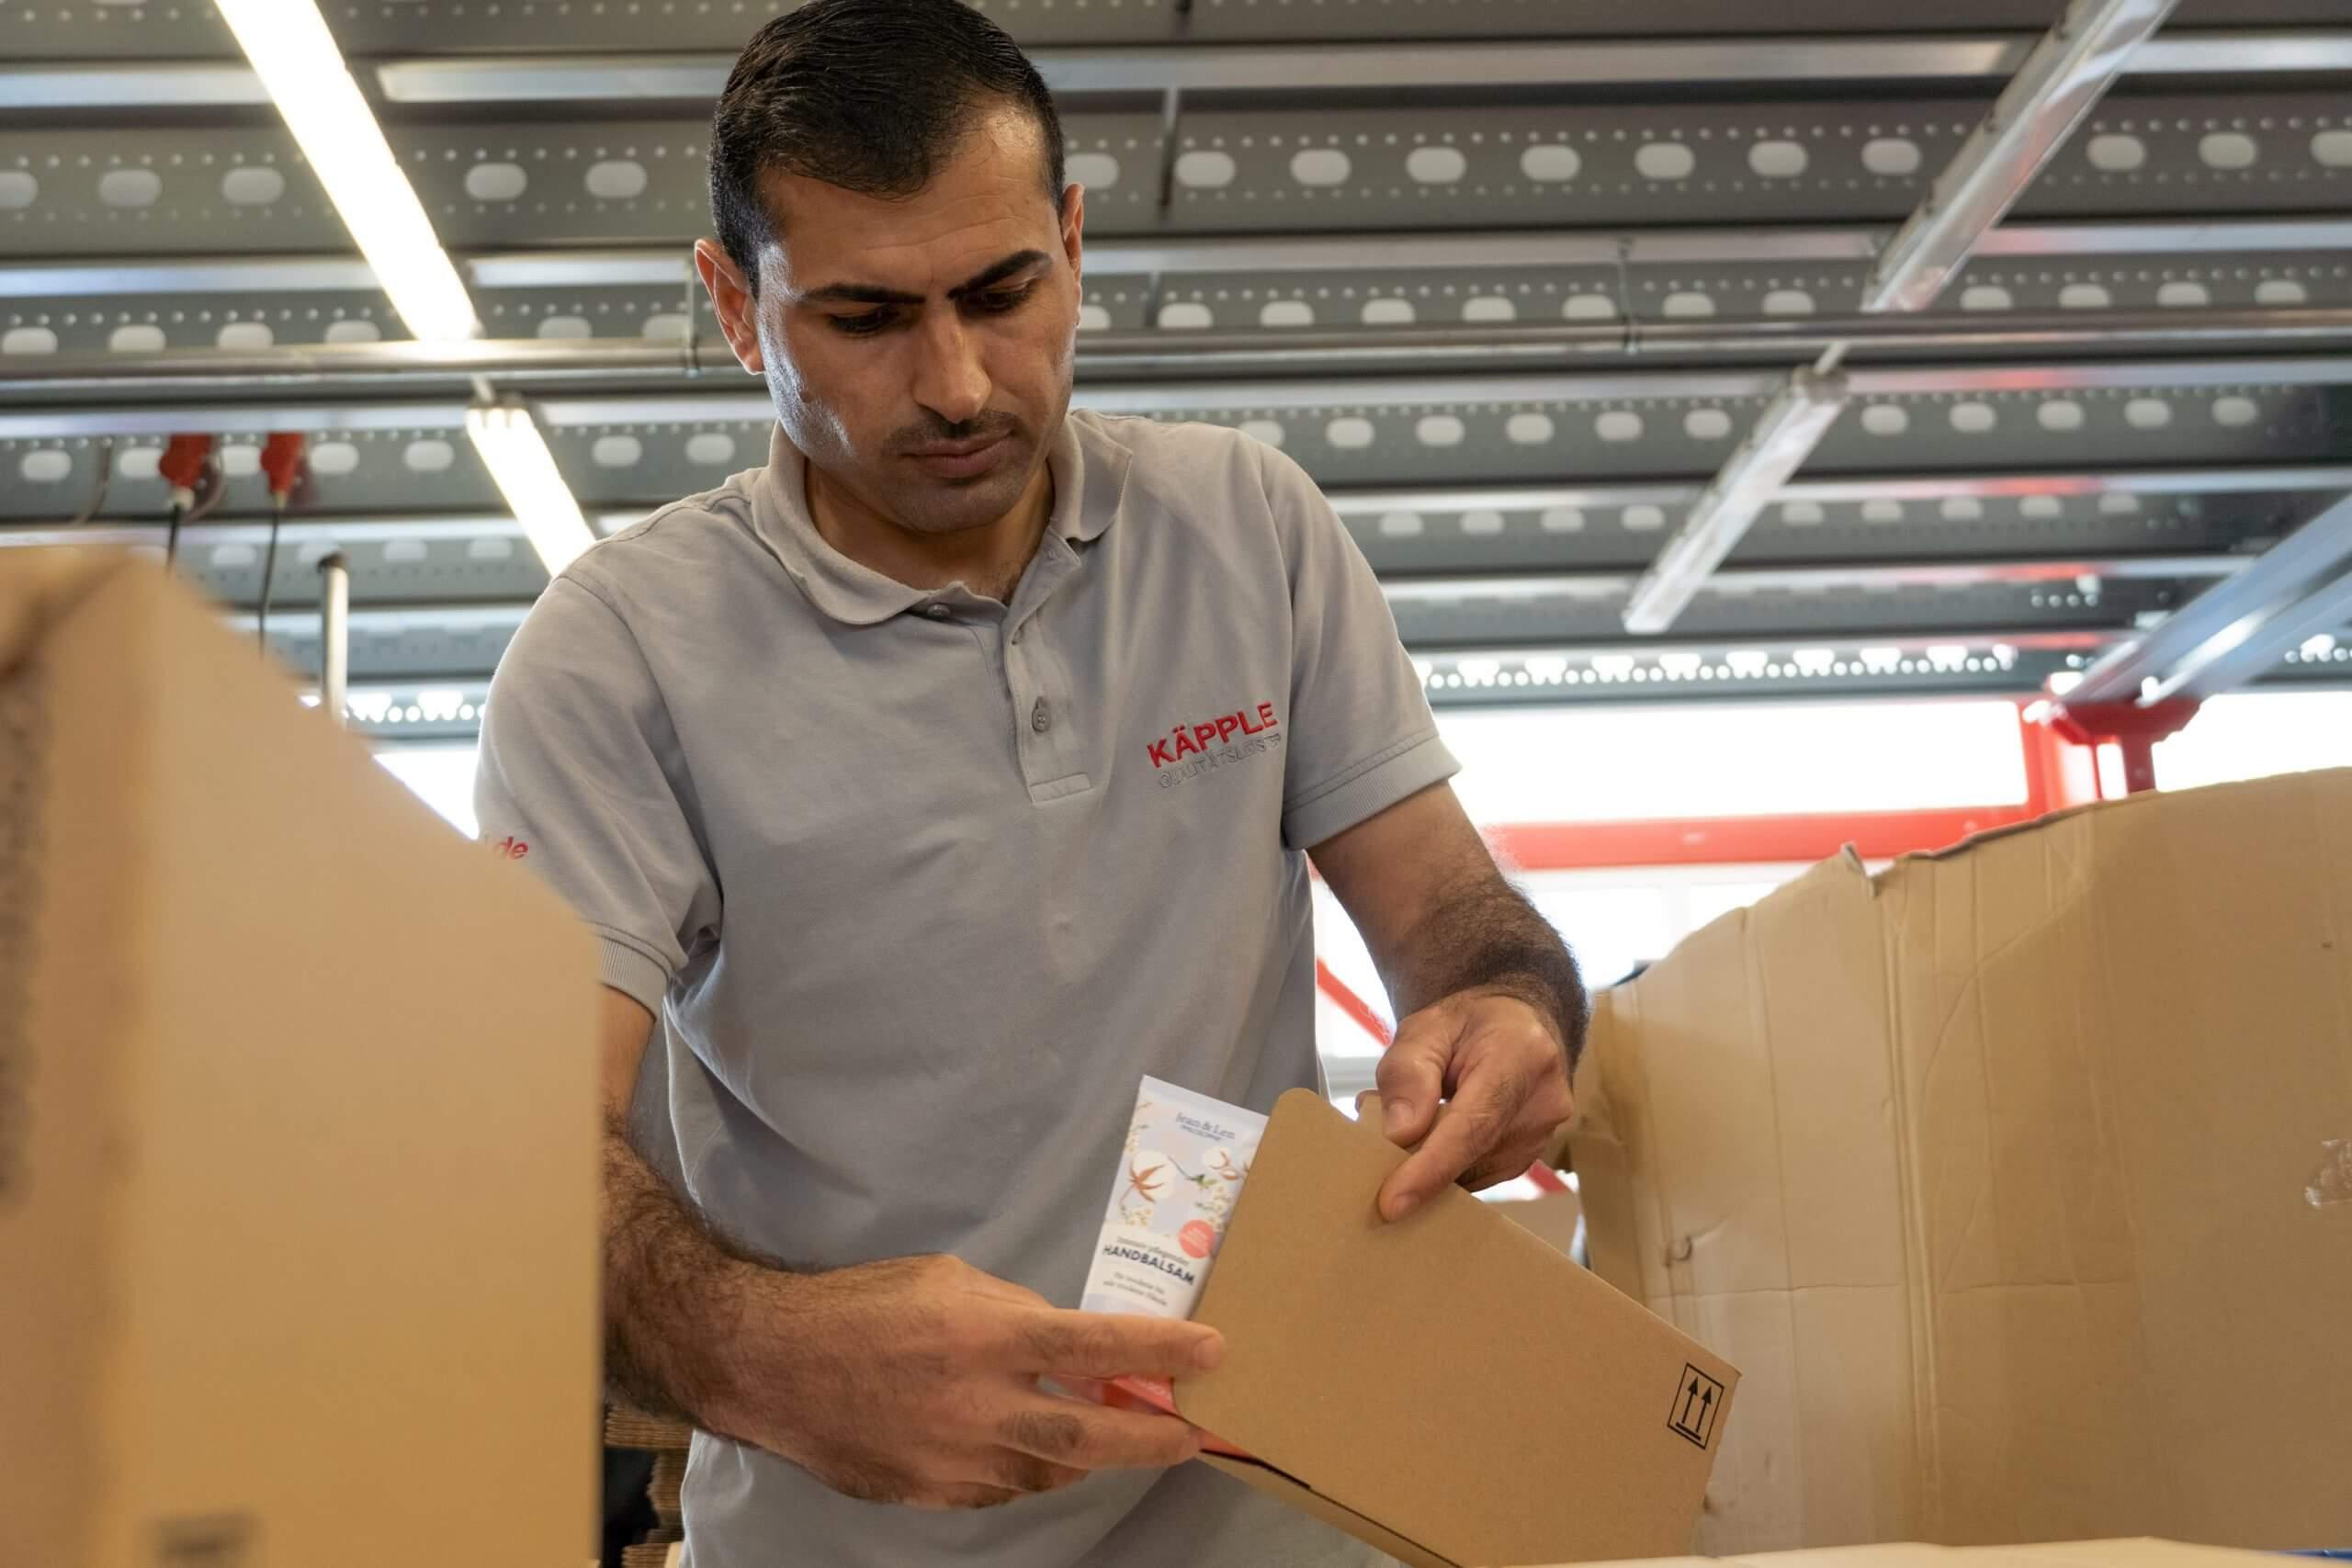 Verpacken1 scaled lohnverpackung lohnfertigung nacharbeit lohnsortierung fulfillment beutelverpackung scaled